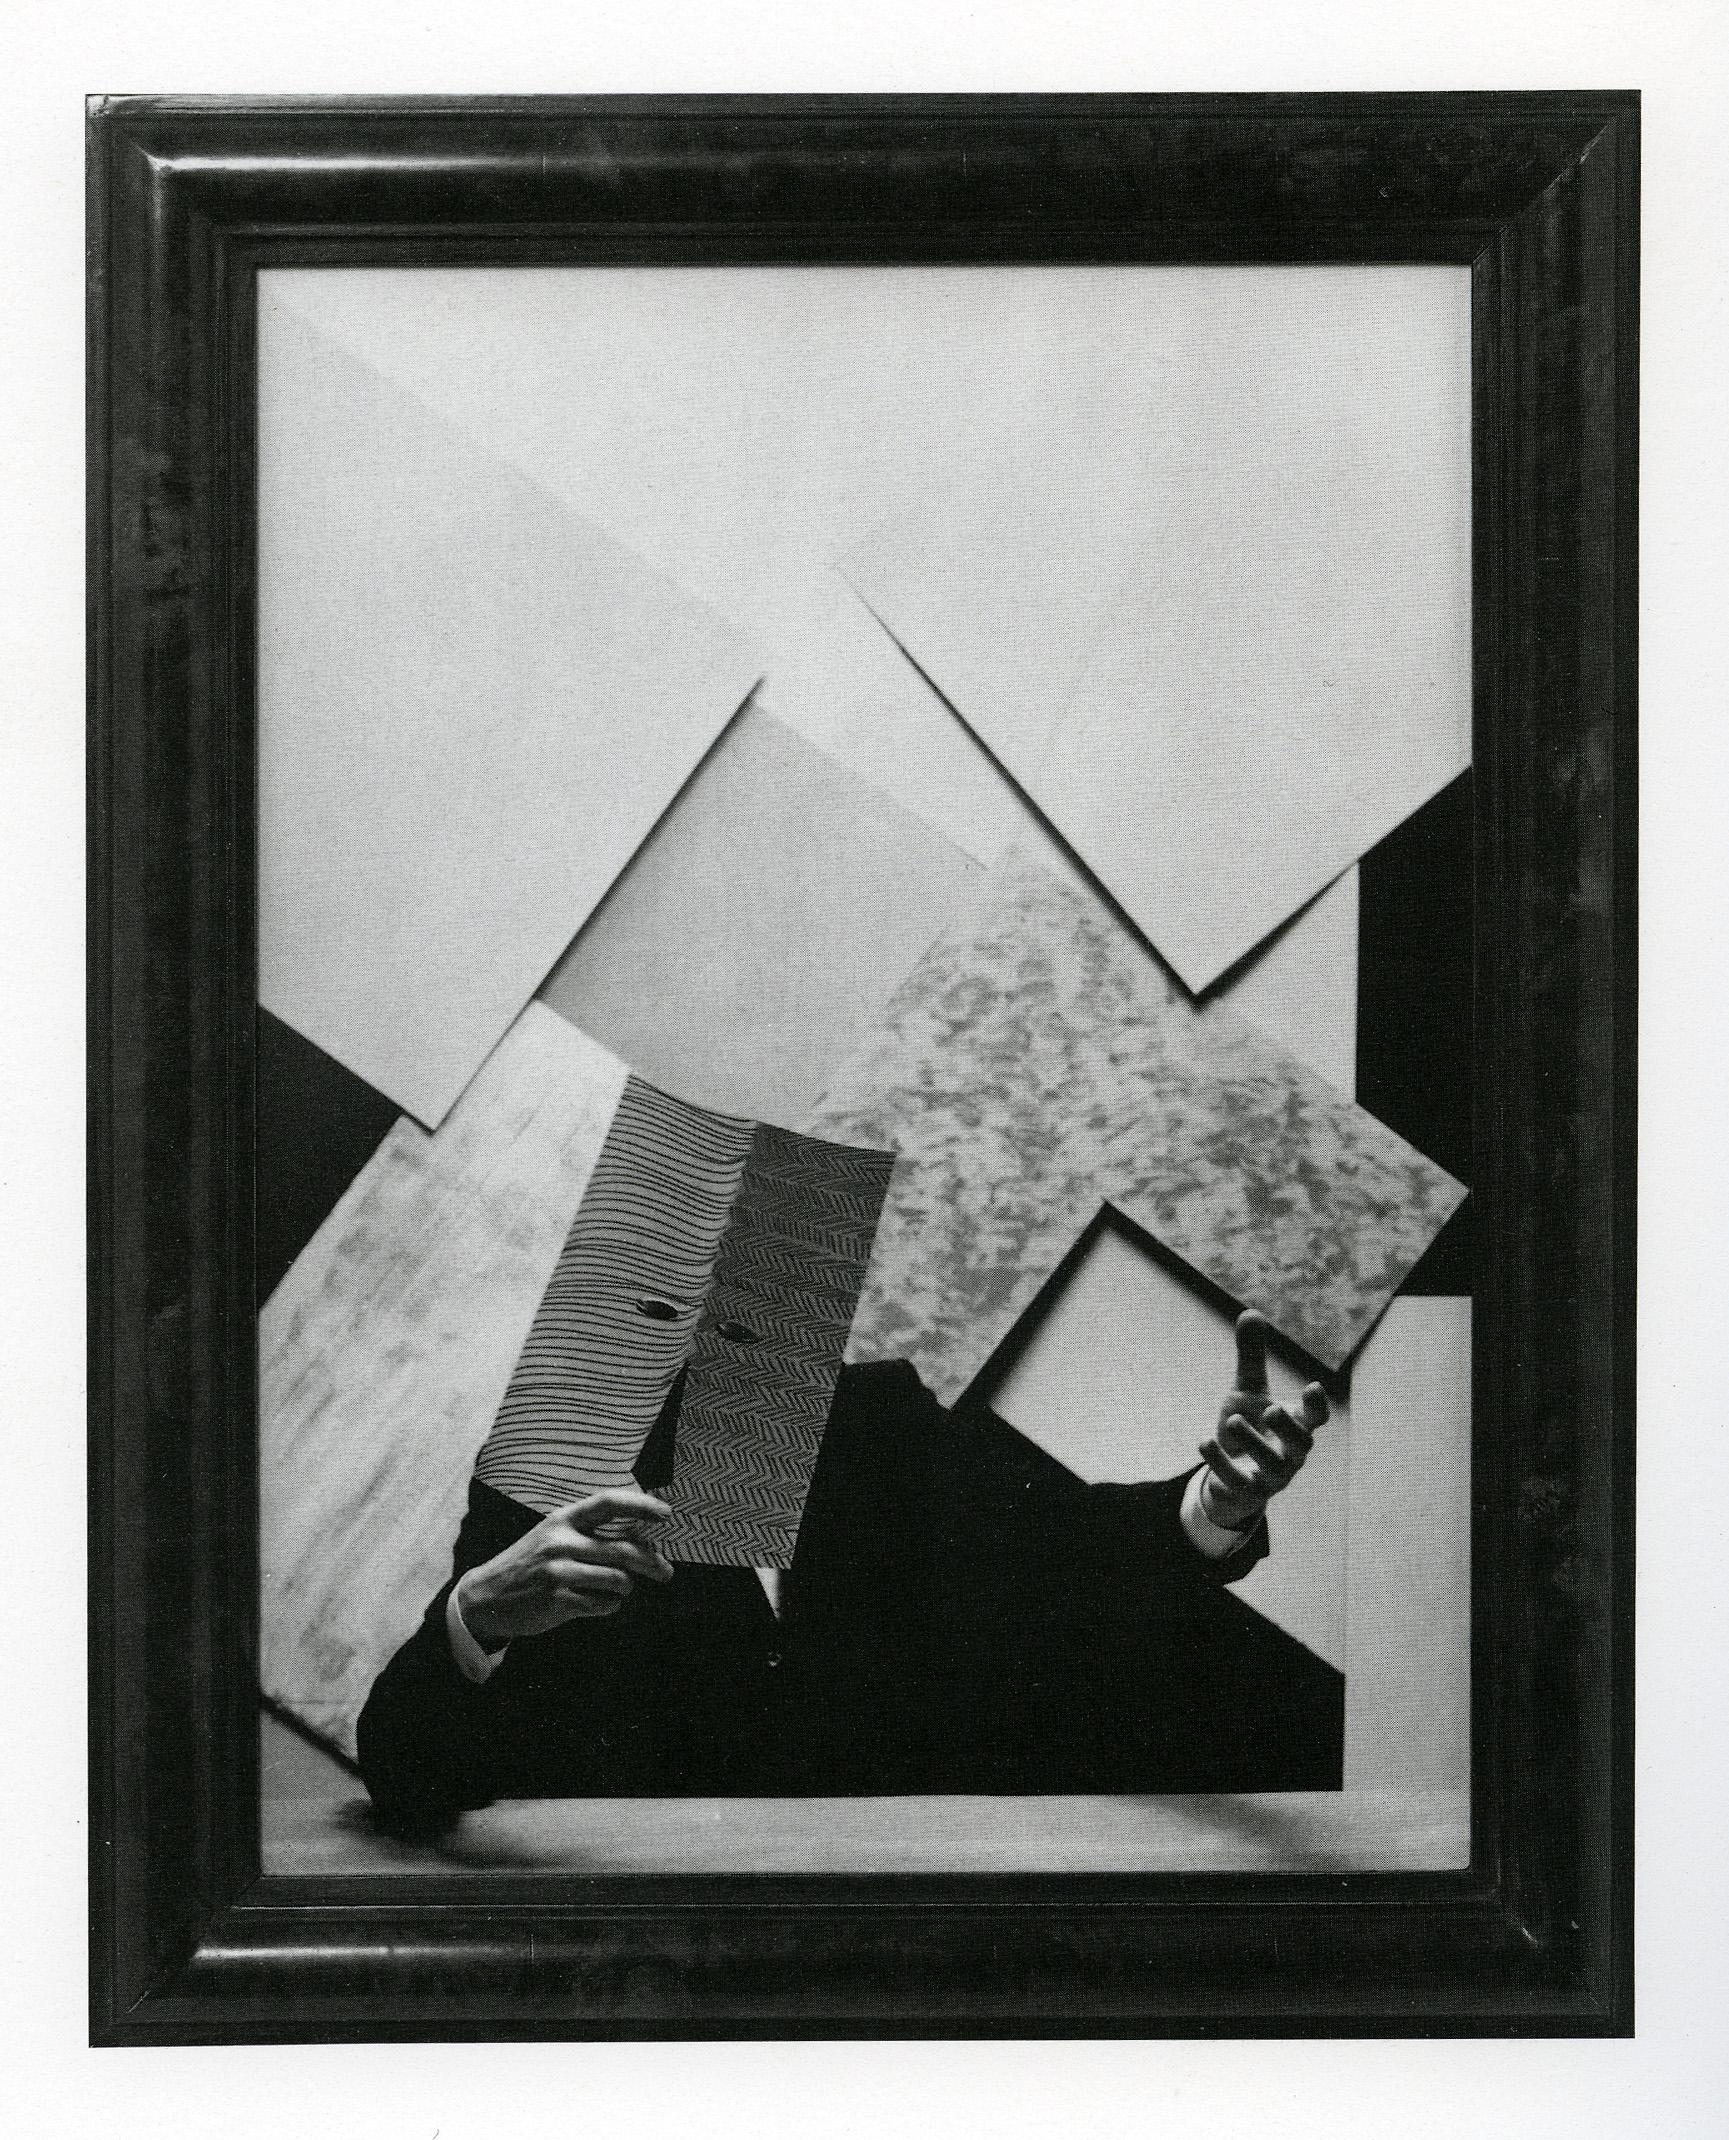 Jan Vercruysse,  Portret Van De Kunstenaar Door Hemzelf (XIV) , 1984, stampa fotolitografica su carta, 70 x 57 cm con cornice, courtesy Tucci Russo Studio per l'Arte Contemporanea, Torre Pellice / Torino